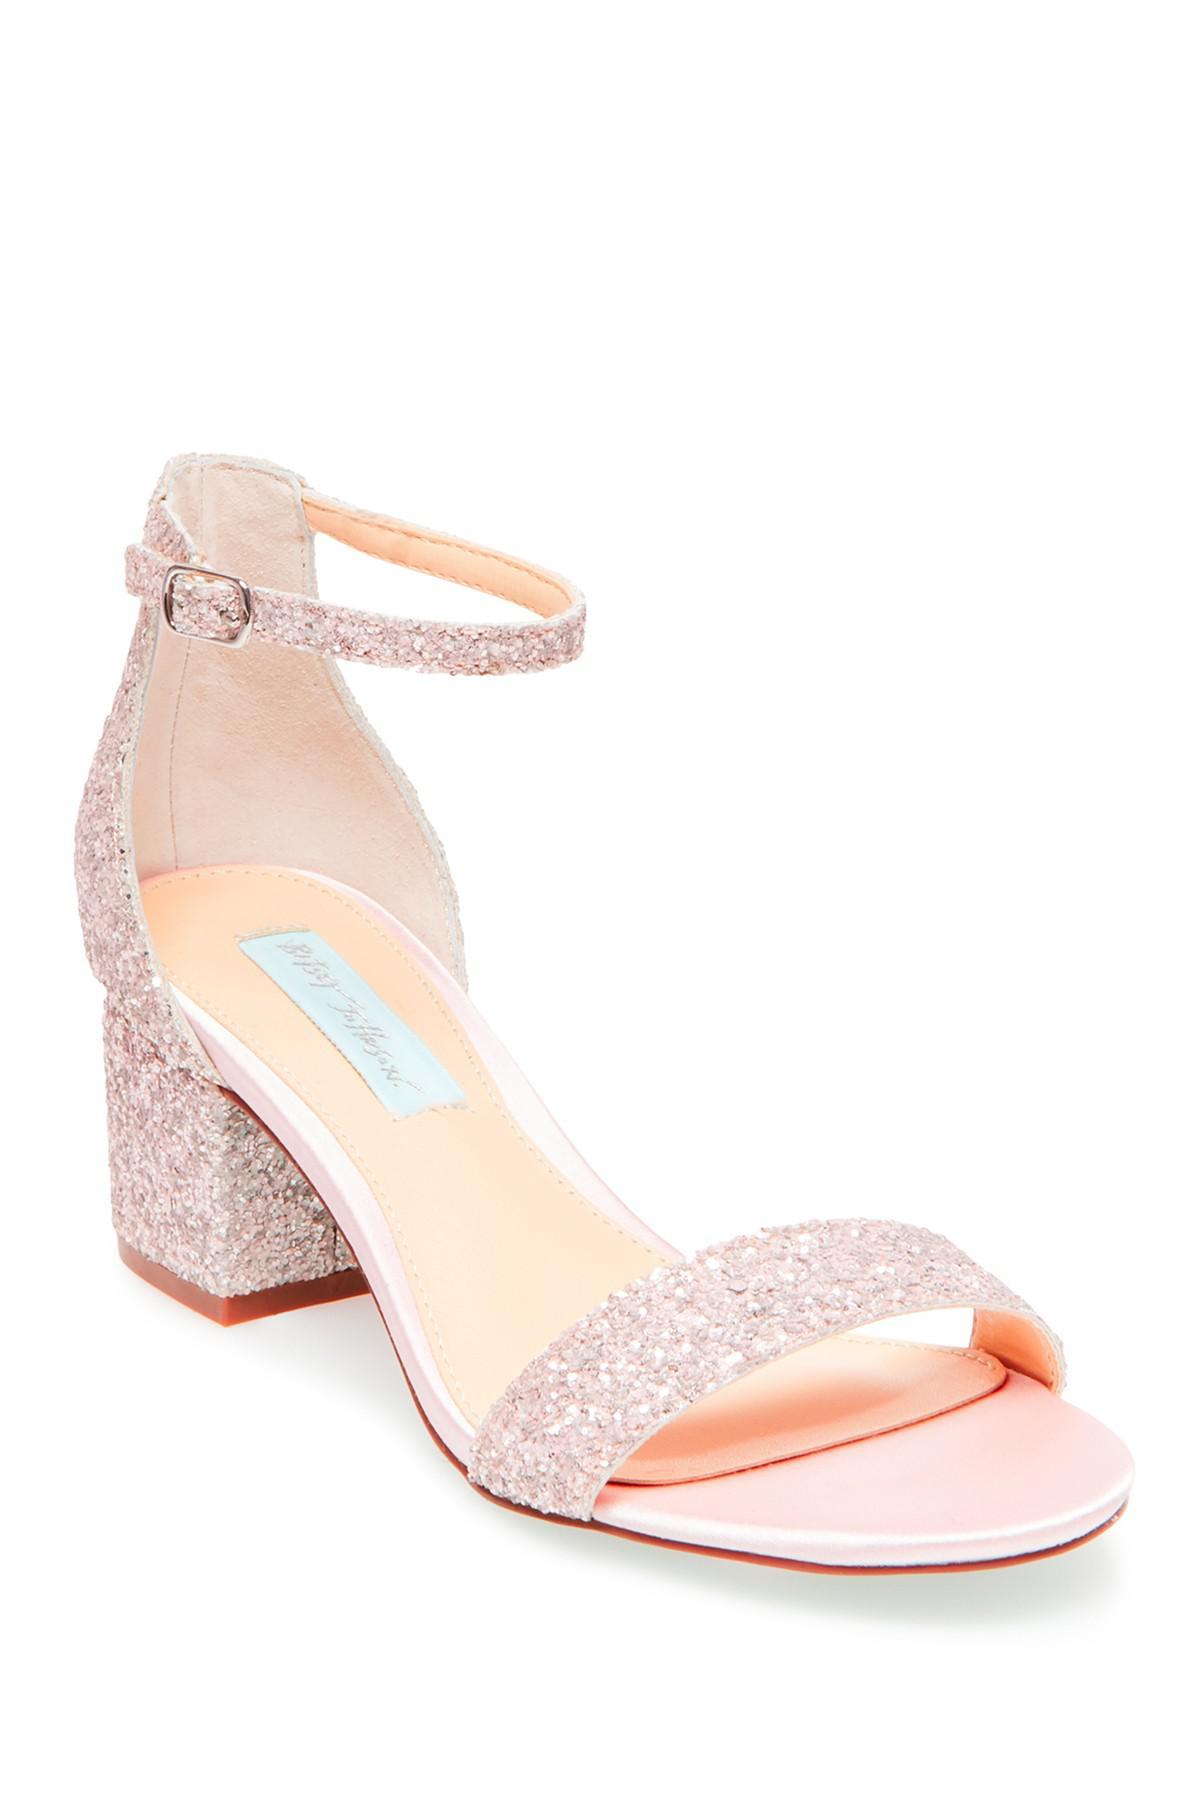 9f5f8f1014b Lyst - Betsey Johnson Jayce Glitter Block Heel Sandal in Pink